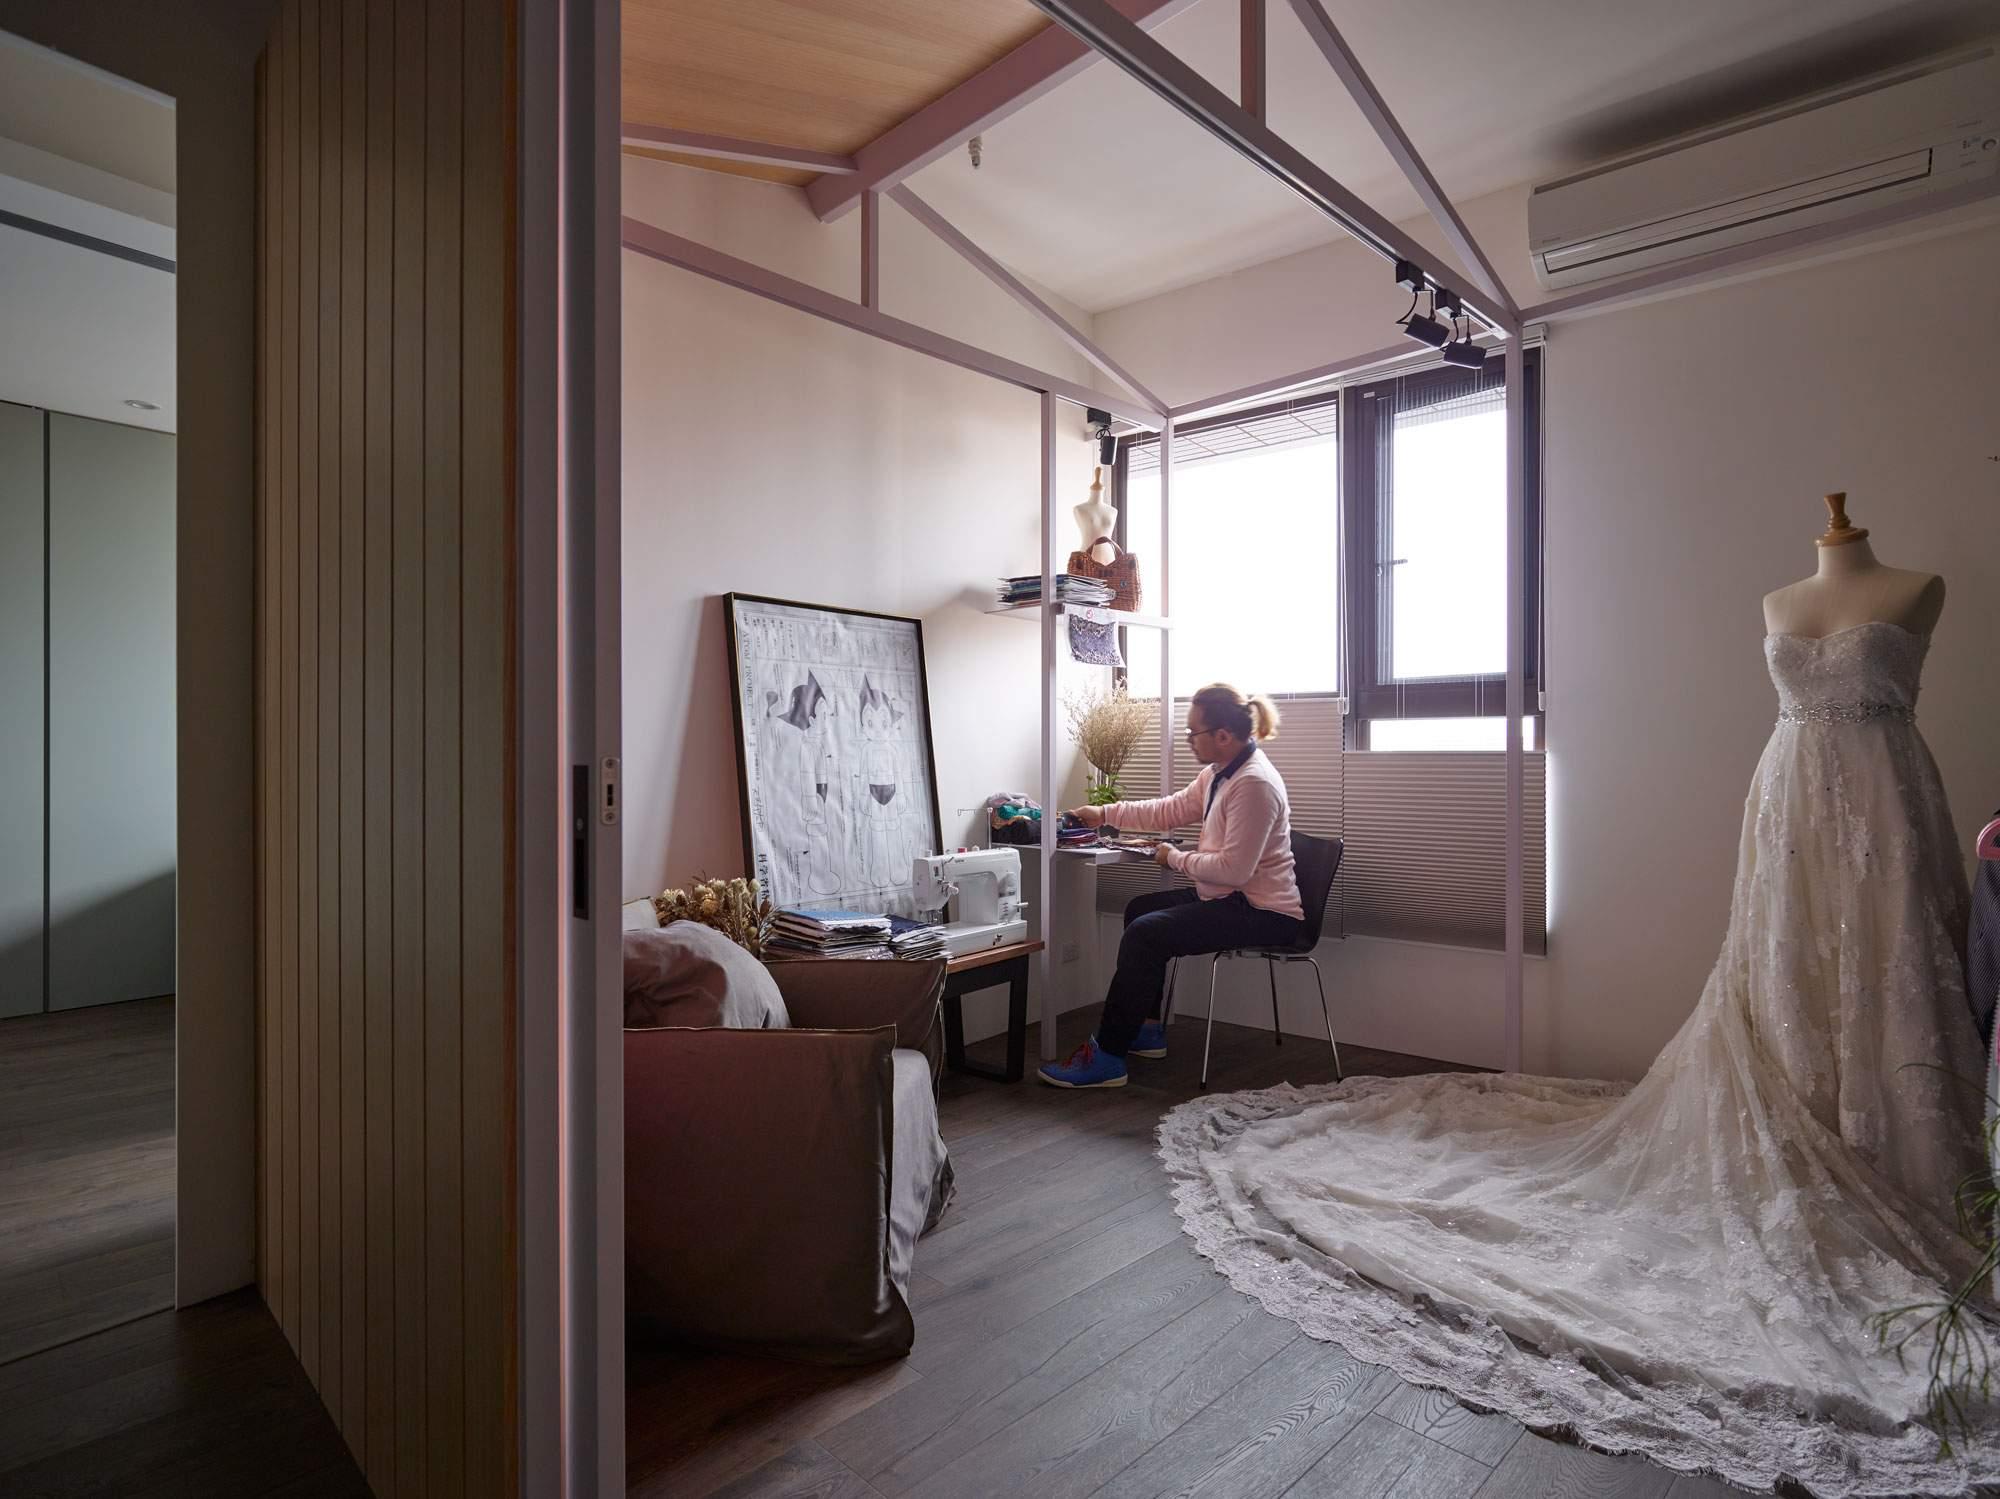 Квартира коллекционеров кукол в Тайване